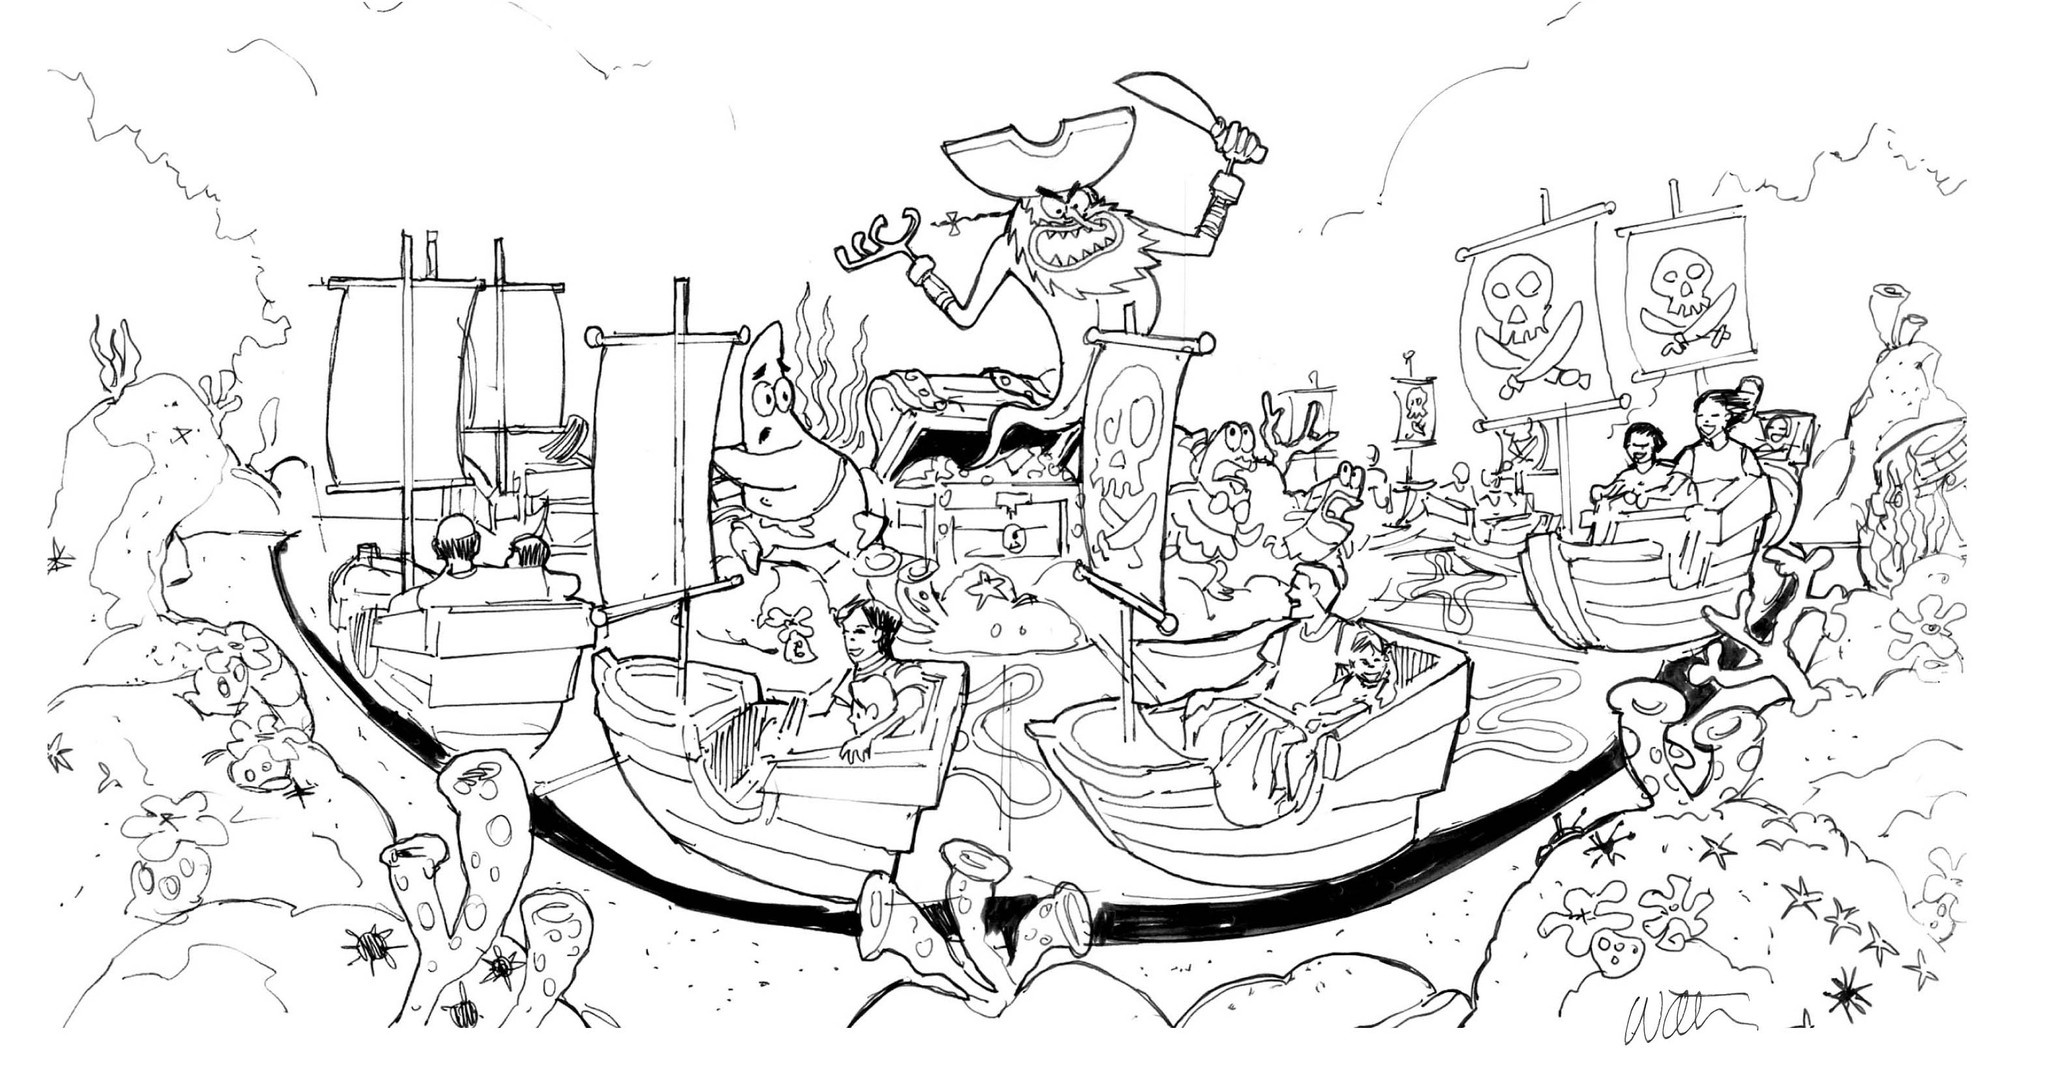 Nickelodeon_60_Flying Dutchman.jpg